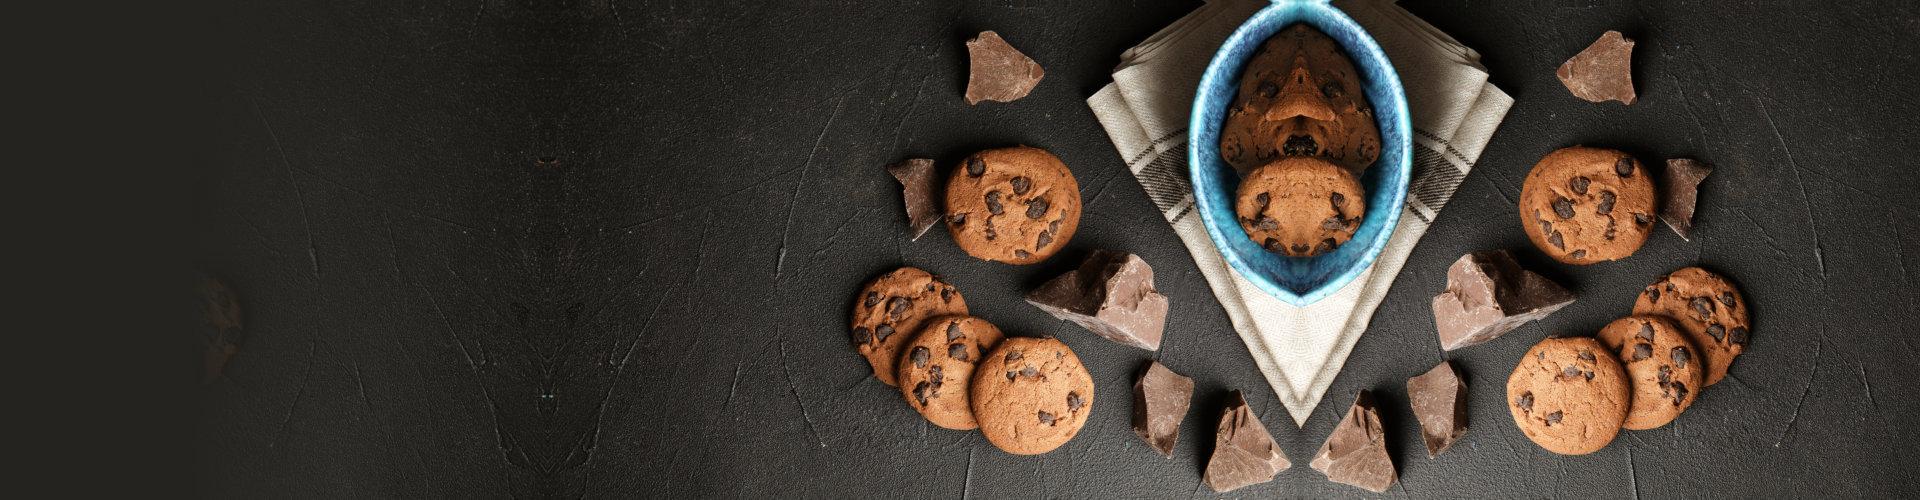 Tasty chocolate chip cookies on dark background, flat lay